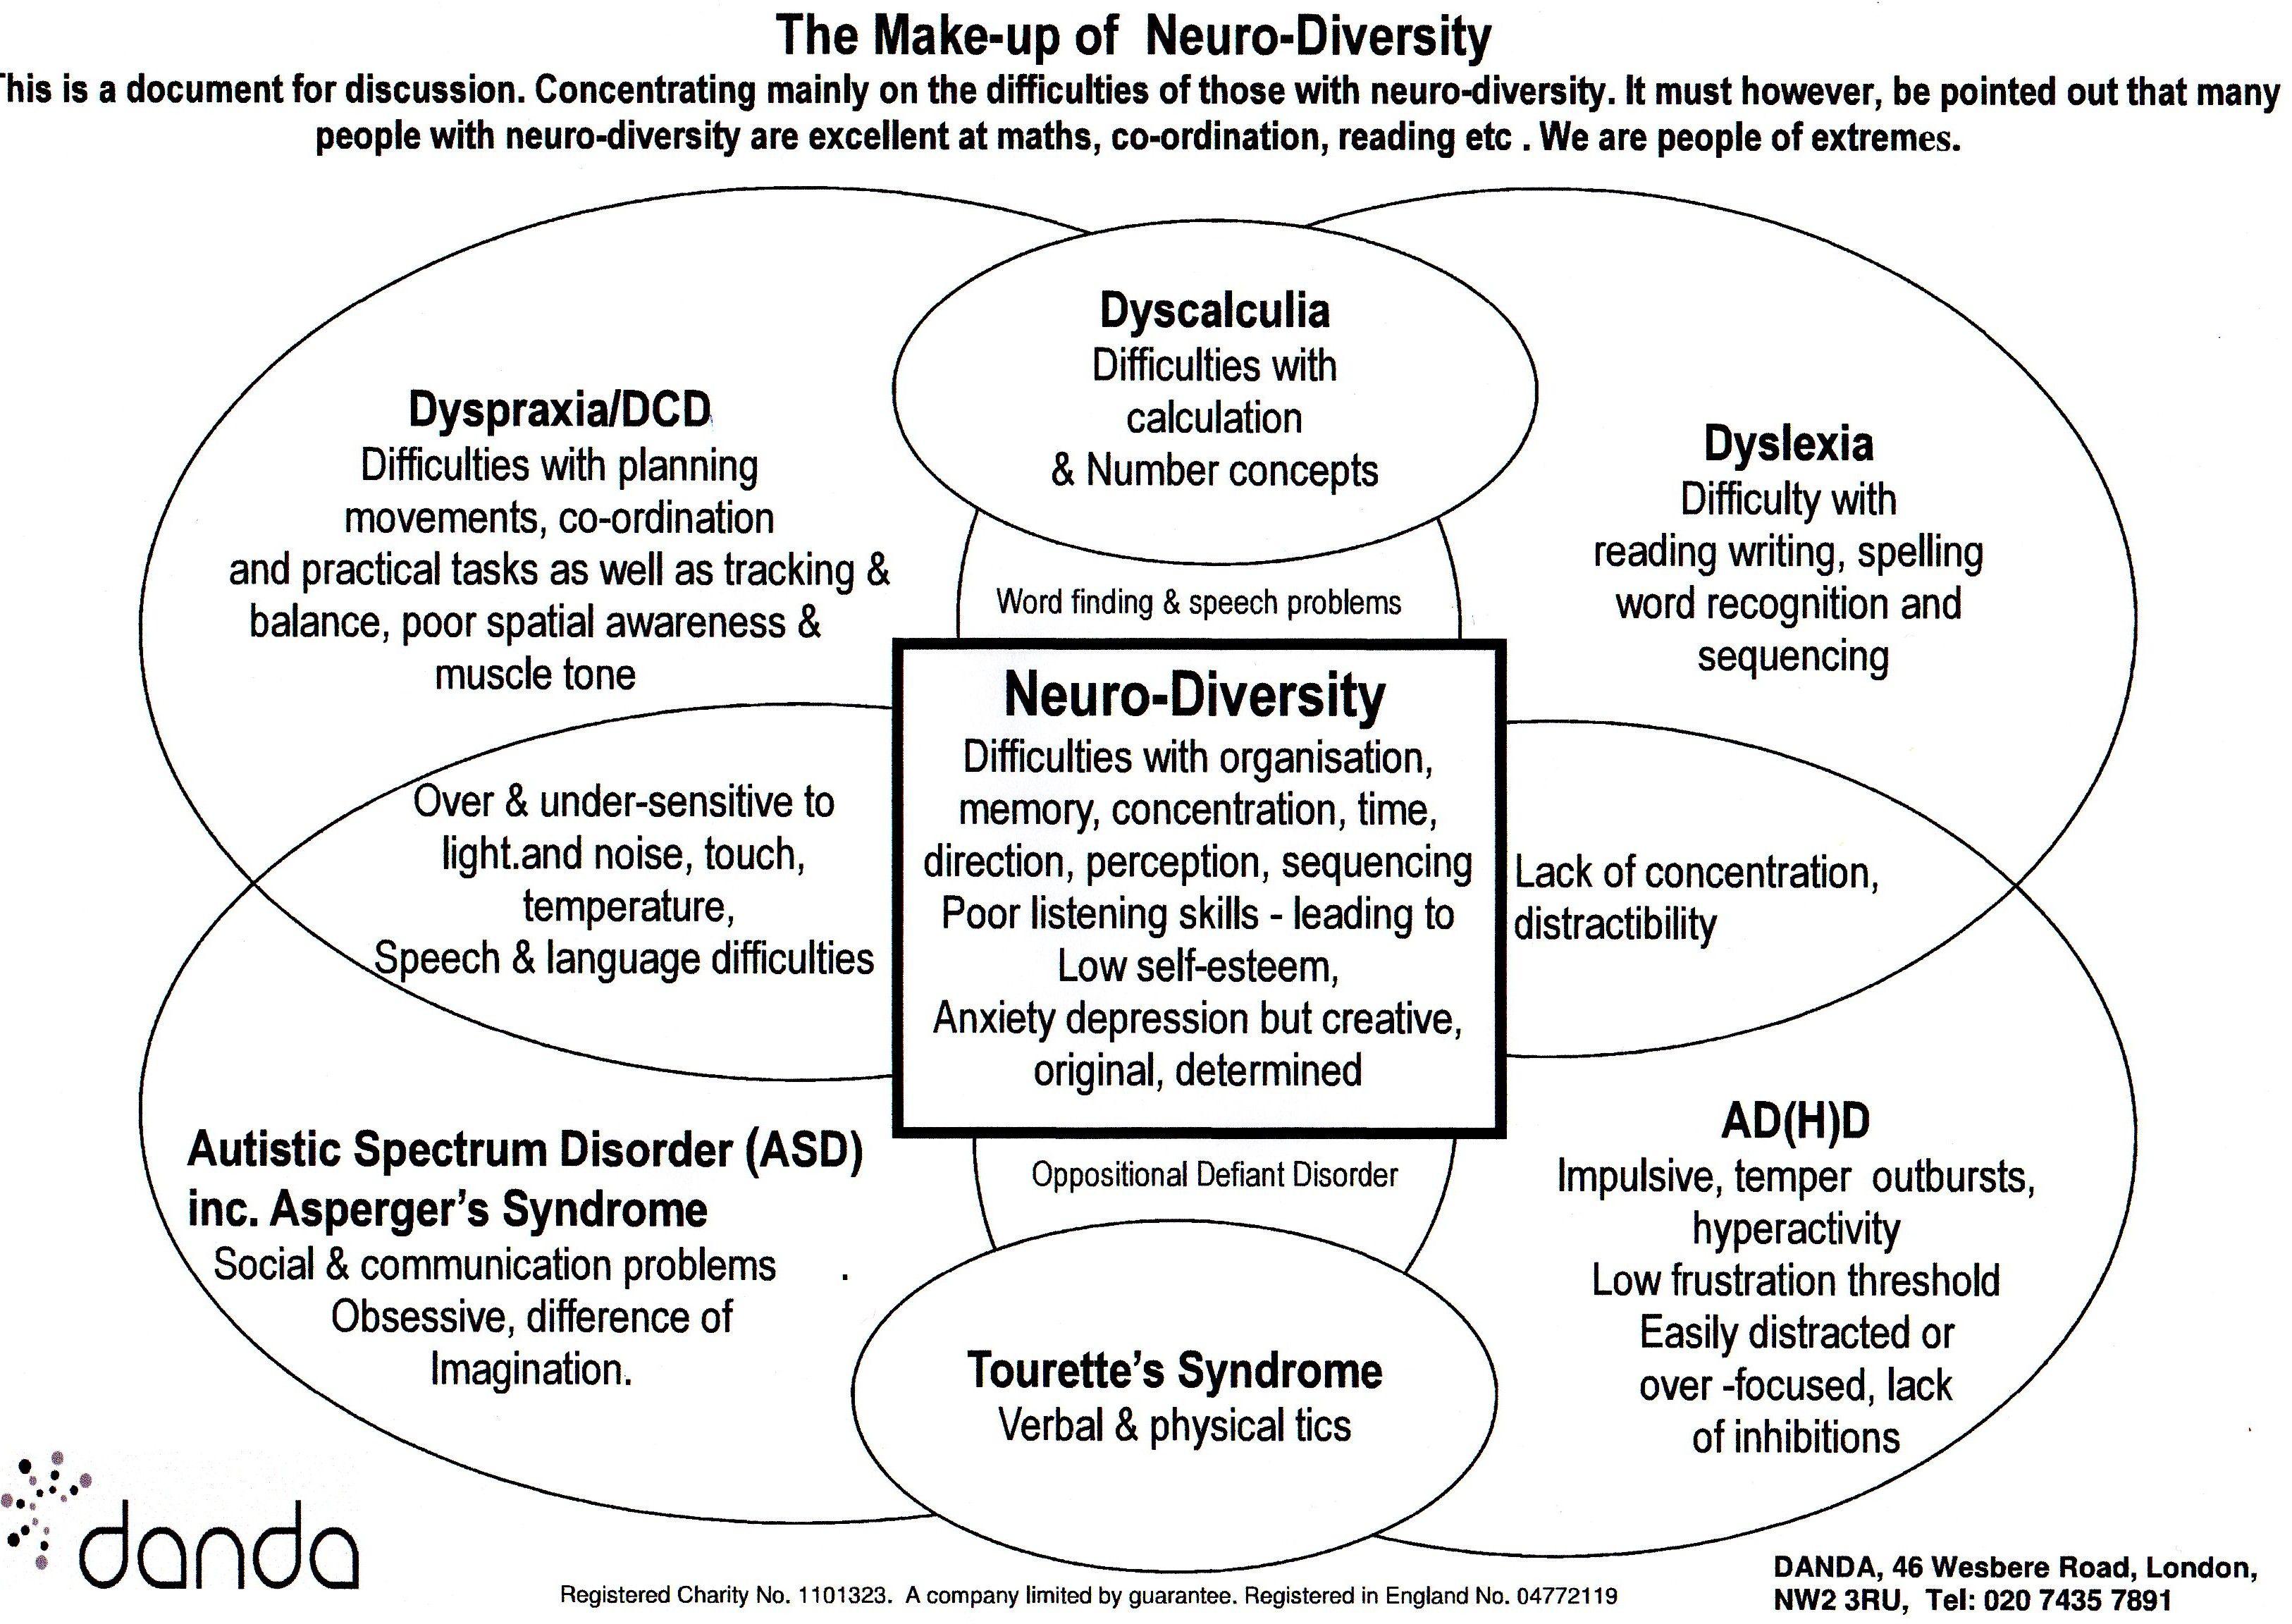 Neurodiversity Diagram Showing How Dyslexia Dyspraxia Ad H D And Asperger S Syndrome Overlap Dyspraxia Dyslexia Dyscalculia